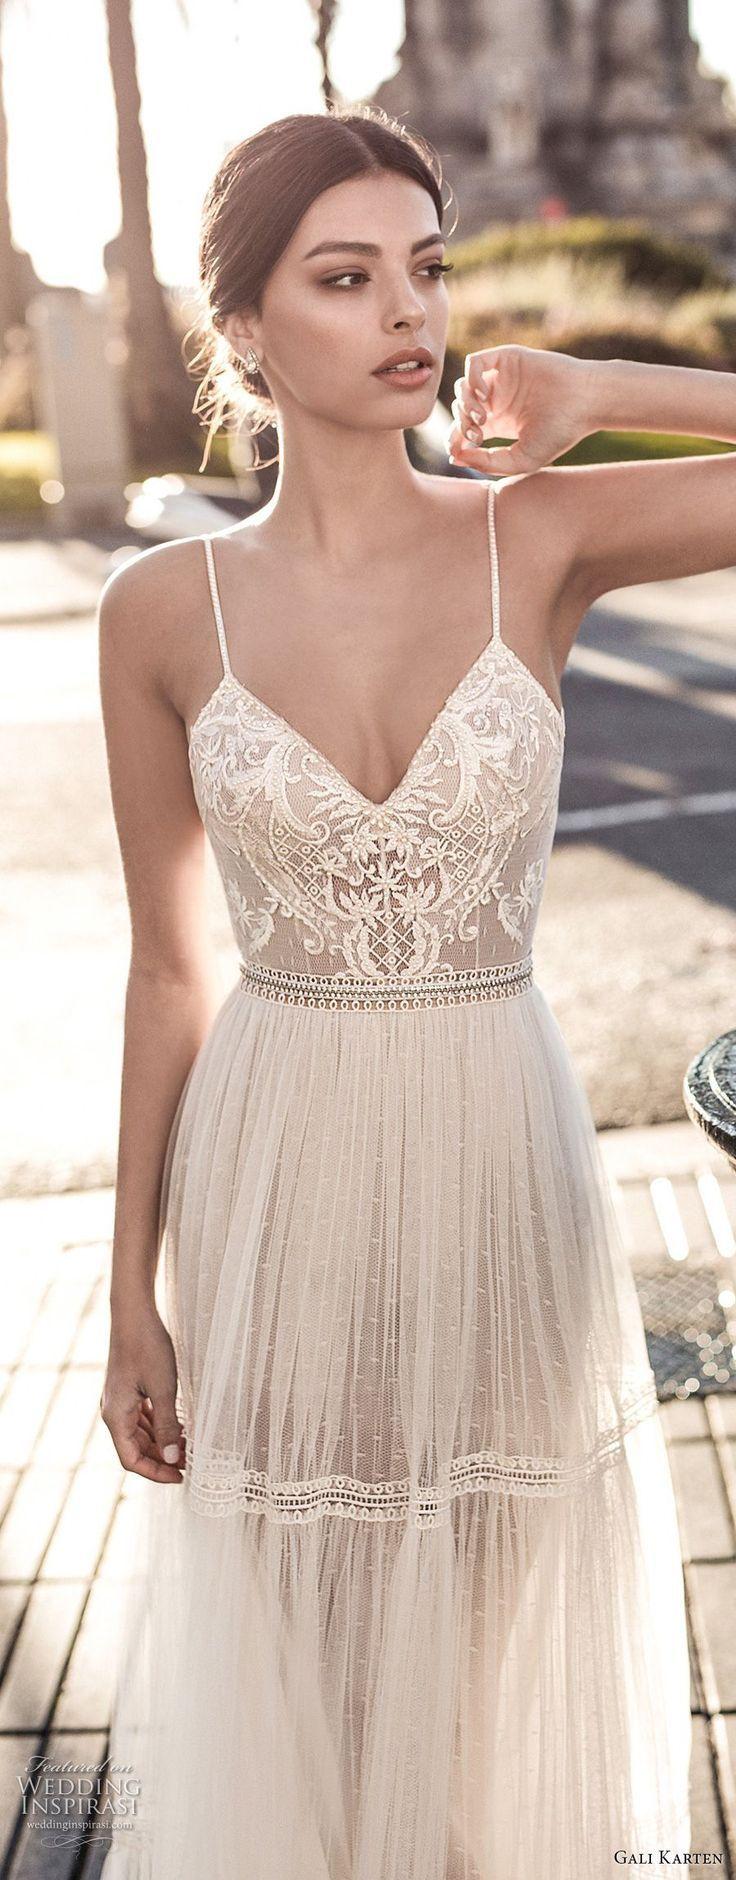 Romona keveza lace wedding dress october 2018  best Bridal images on Pinterest  Bridal gowns Short wedding